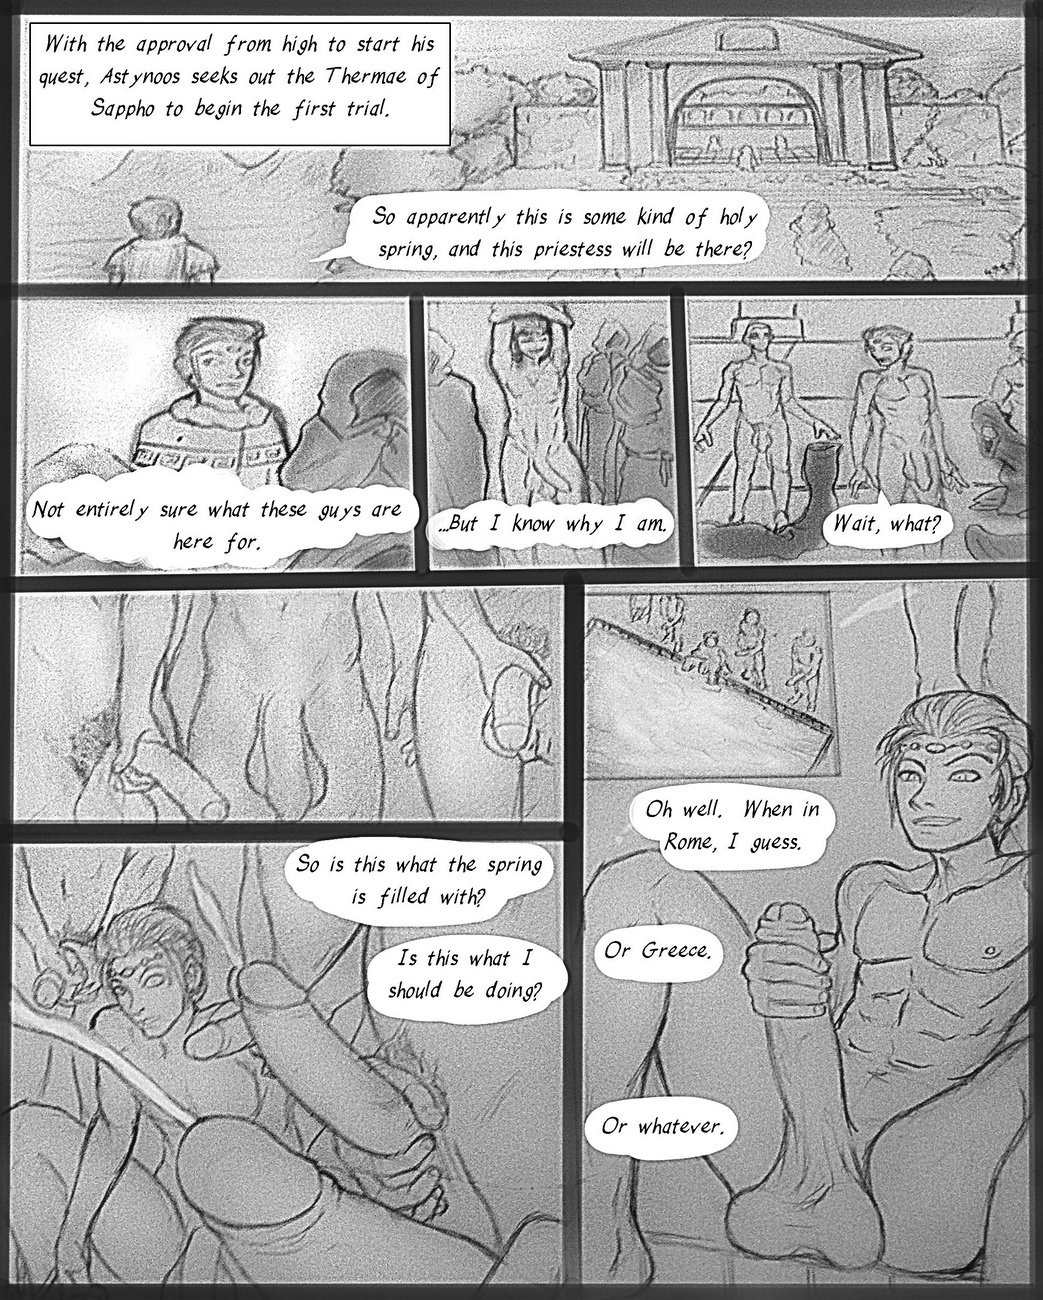 Astynoos-And-The-4-Priestesses-Of-Aphrodite 4 free sex comic